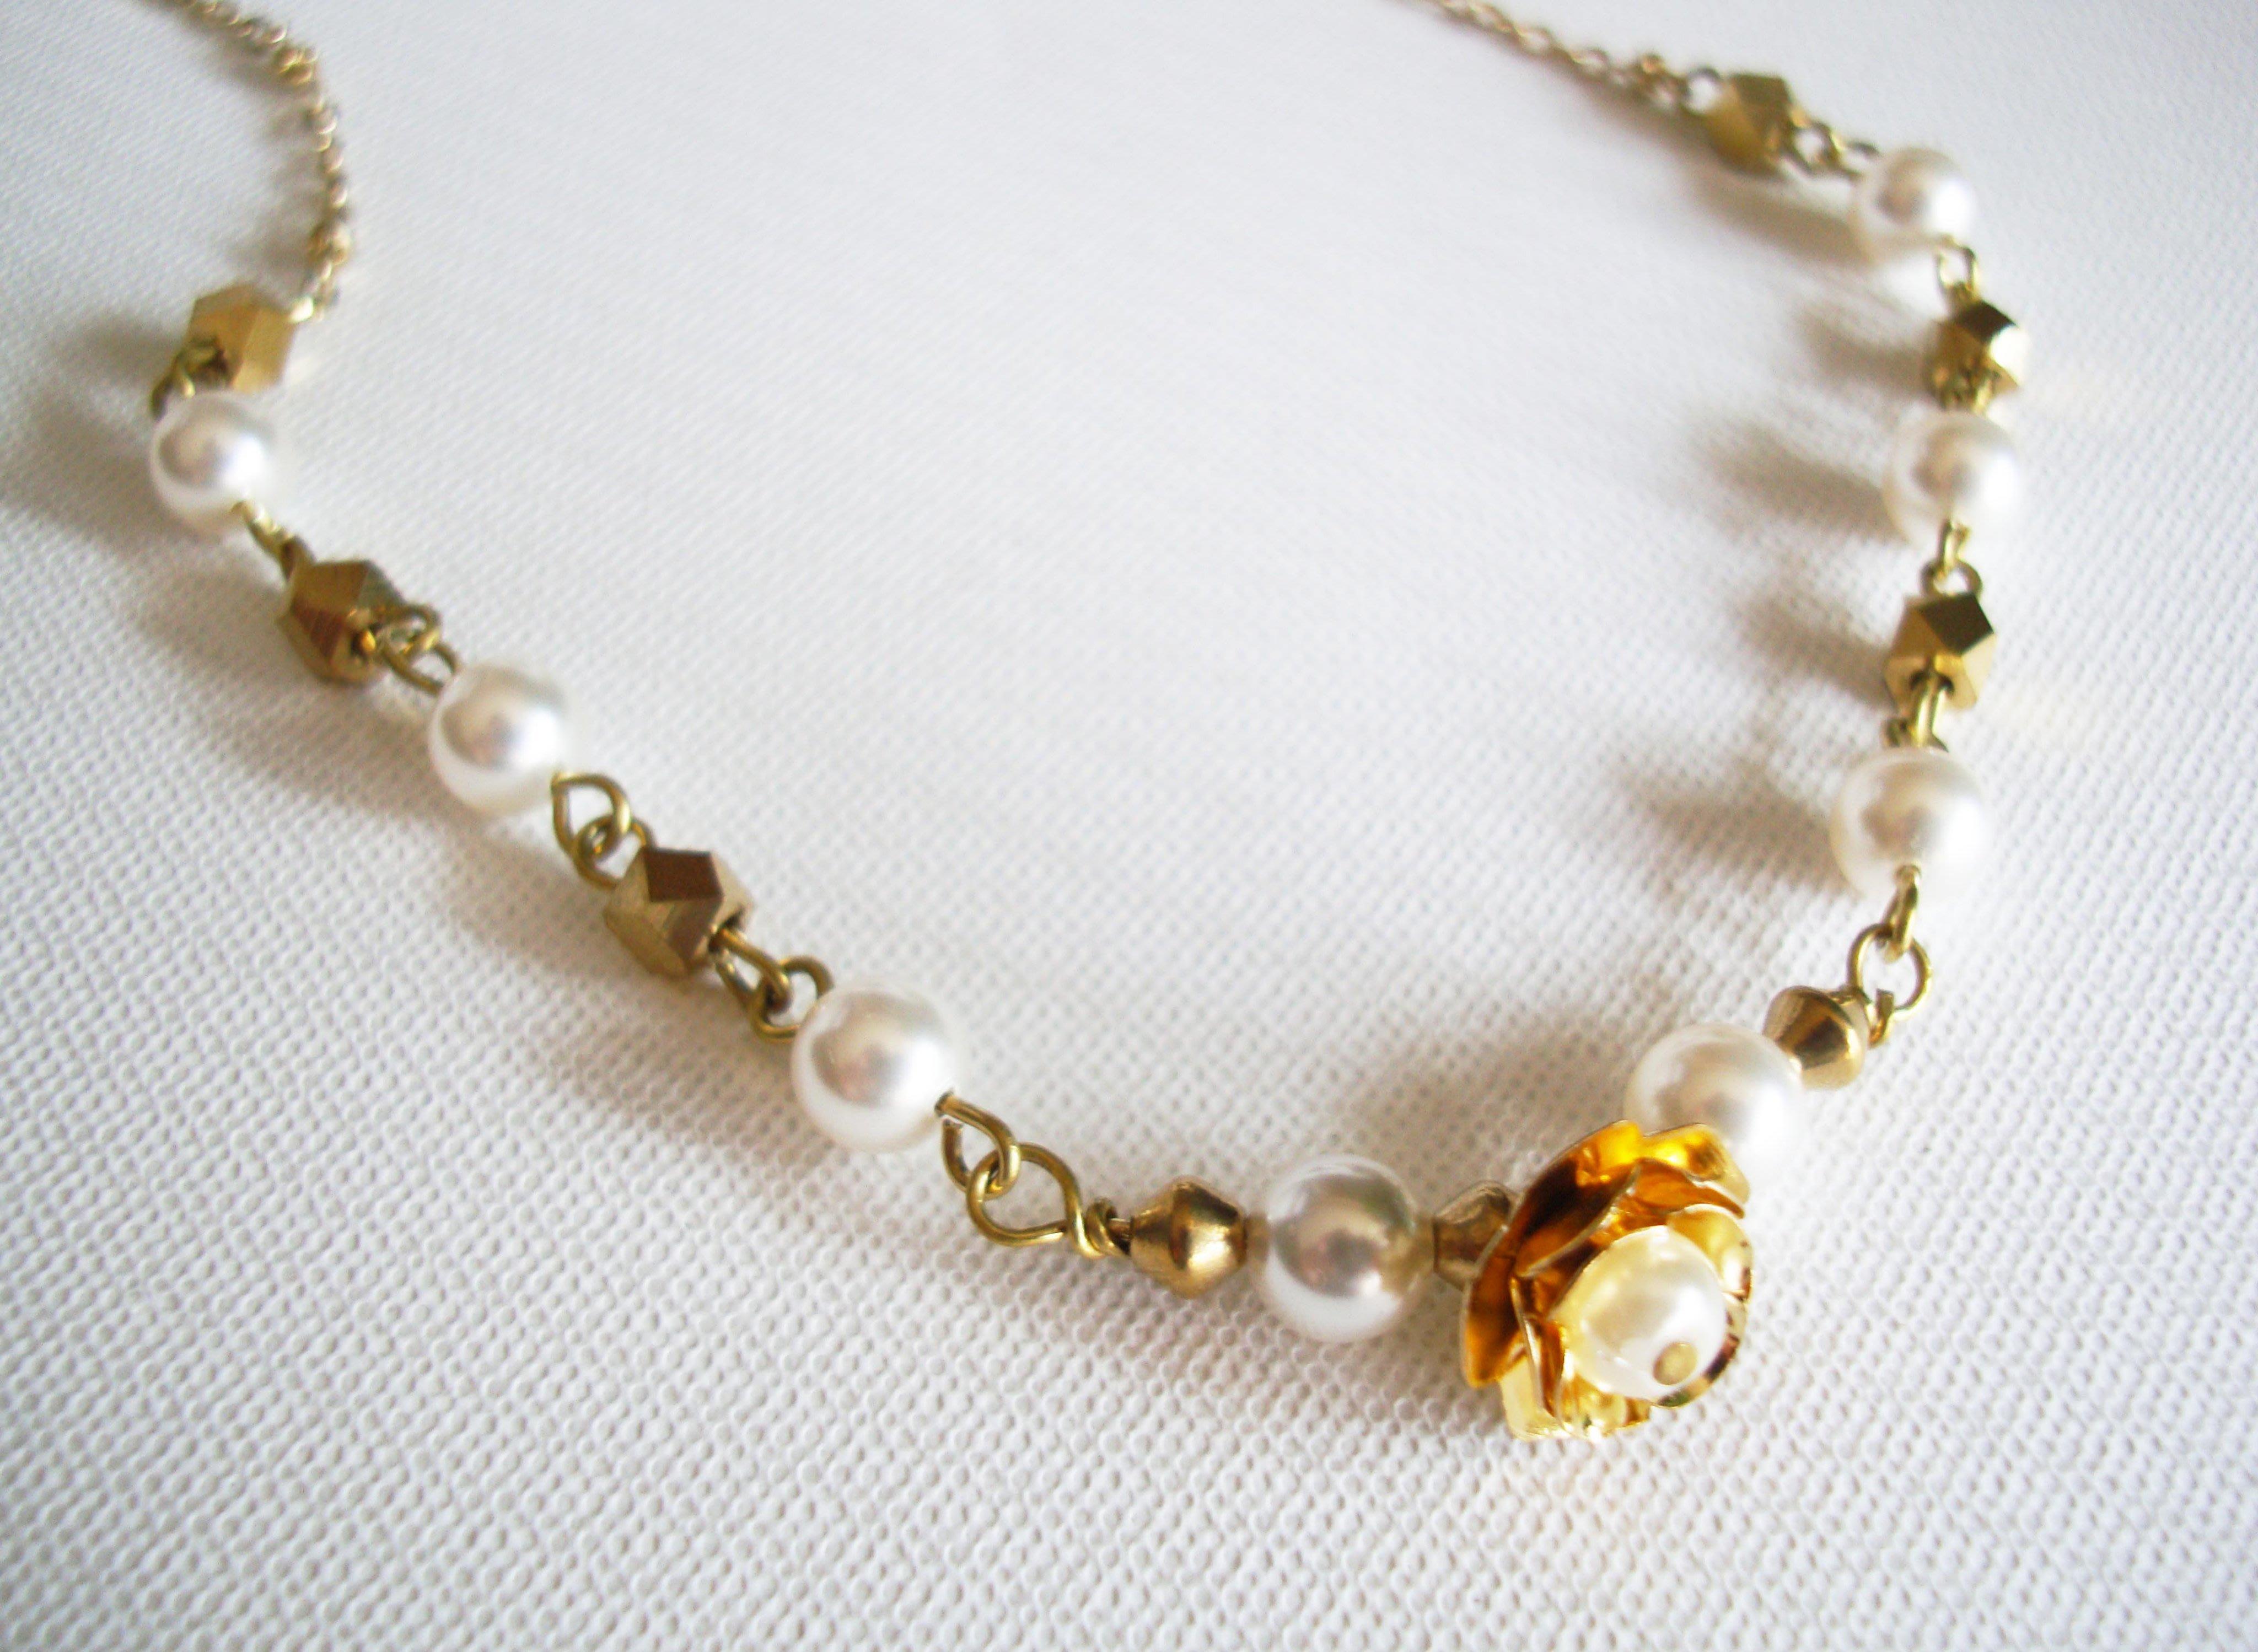 Sophia accessories【Rose】玫瑰珍珠黃銅項鍊 手作&私飾 微復古 輕珠寶 黃銅飾品